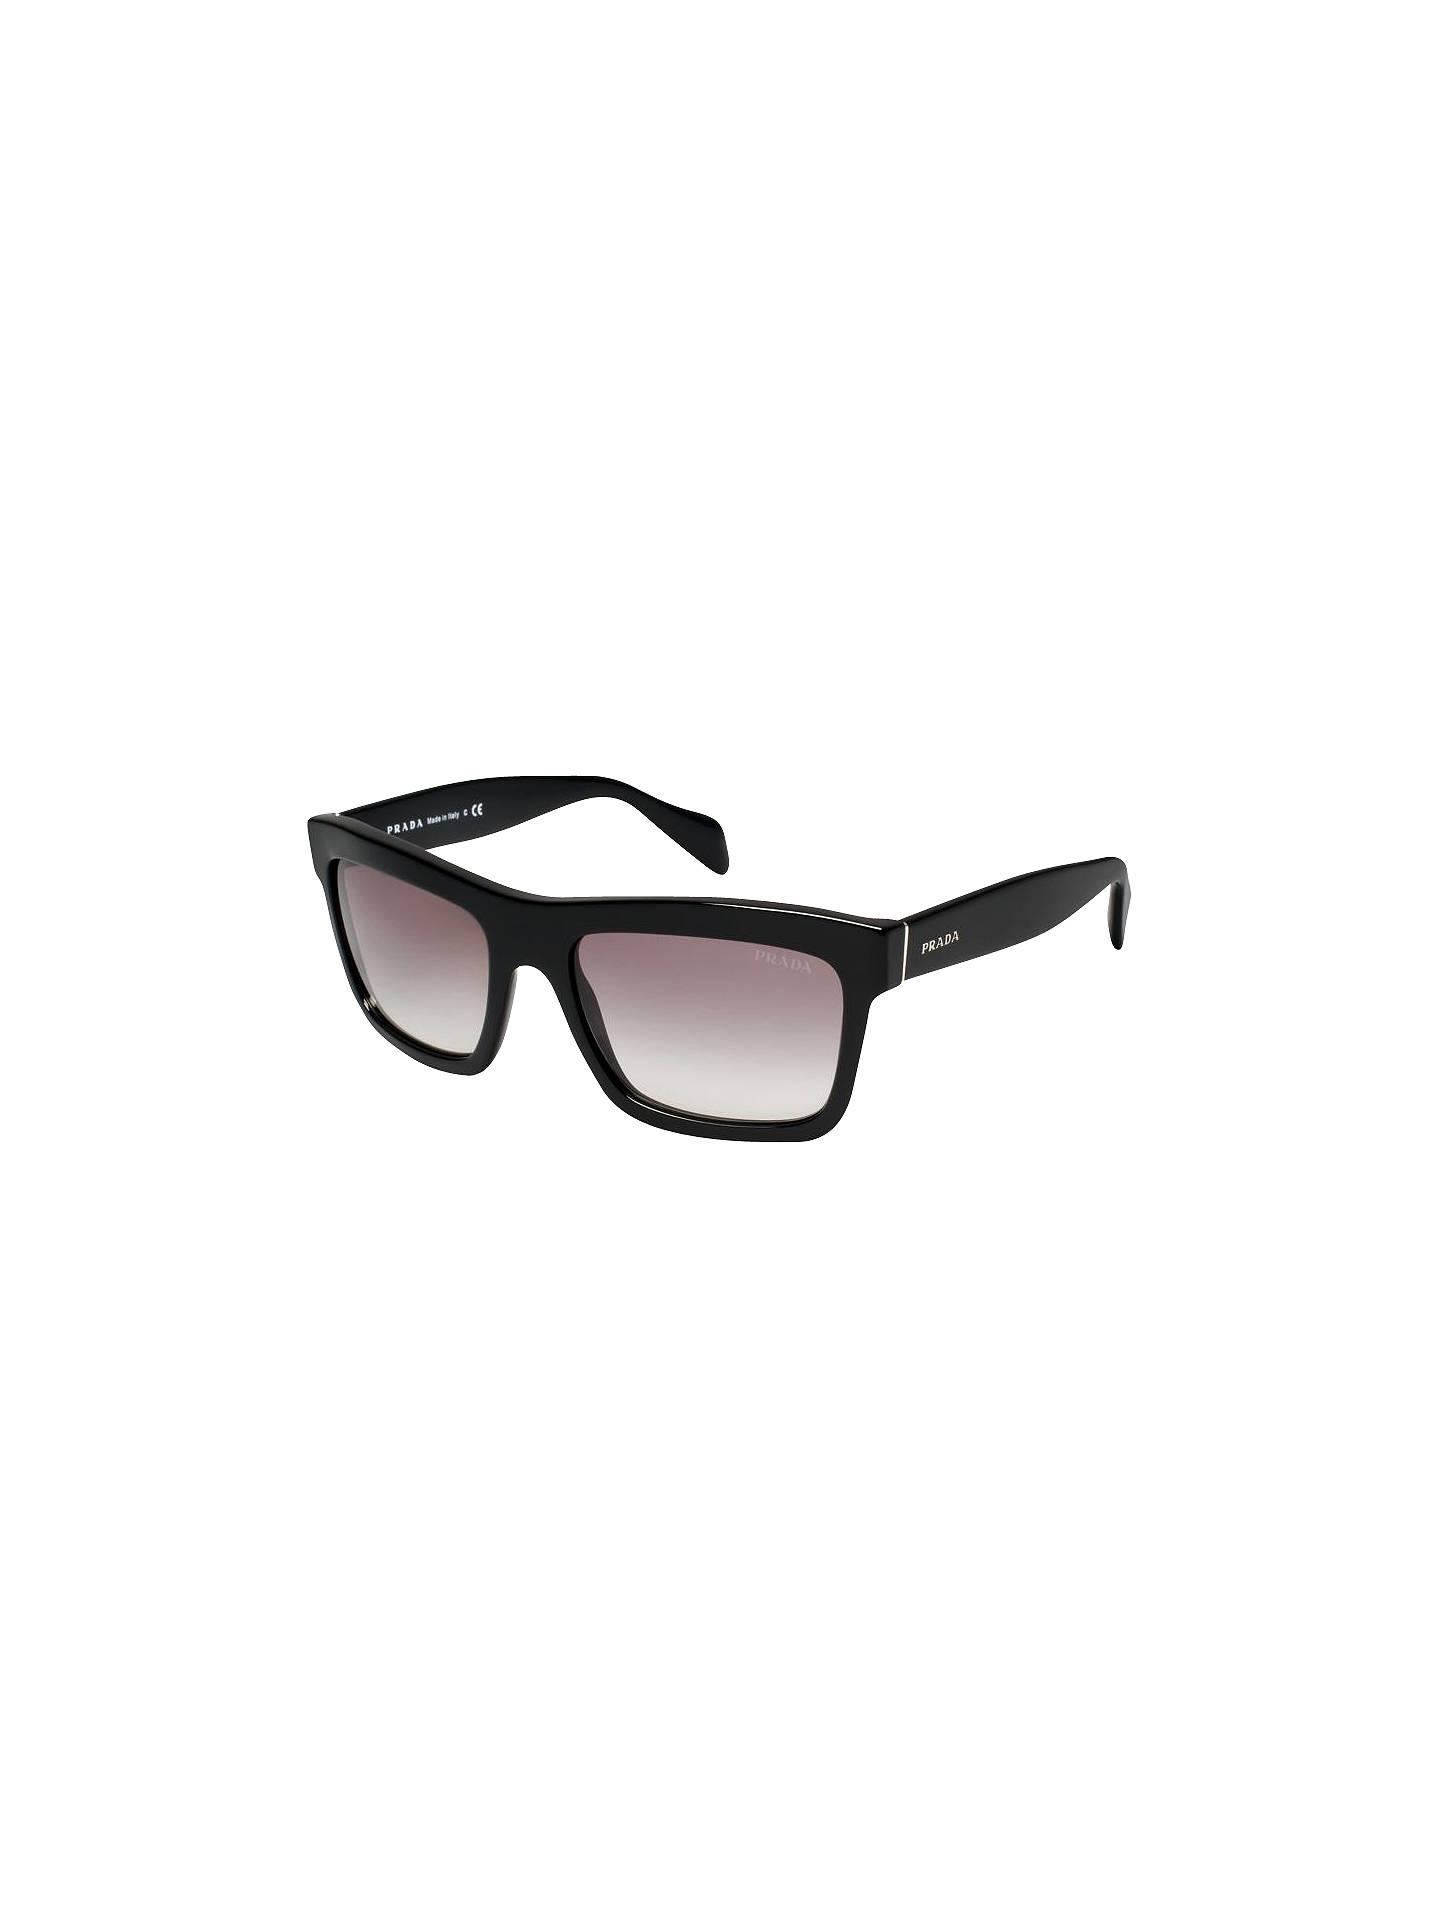 Prada PR25QS D-Frame Sunglasses at John Lewis & Partners